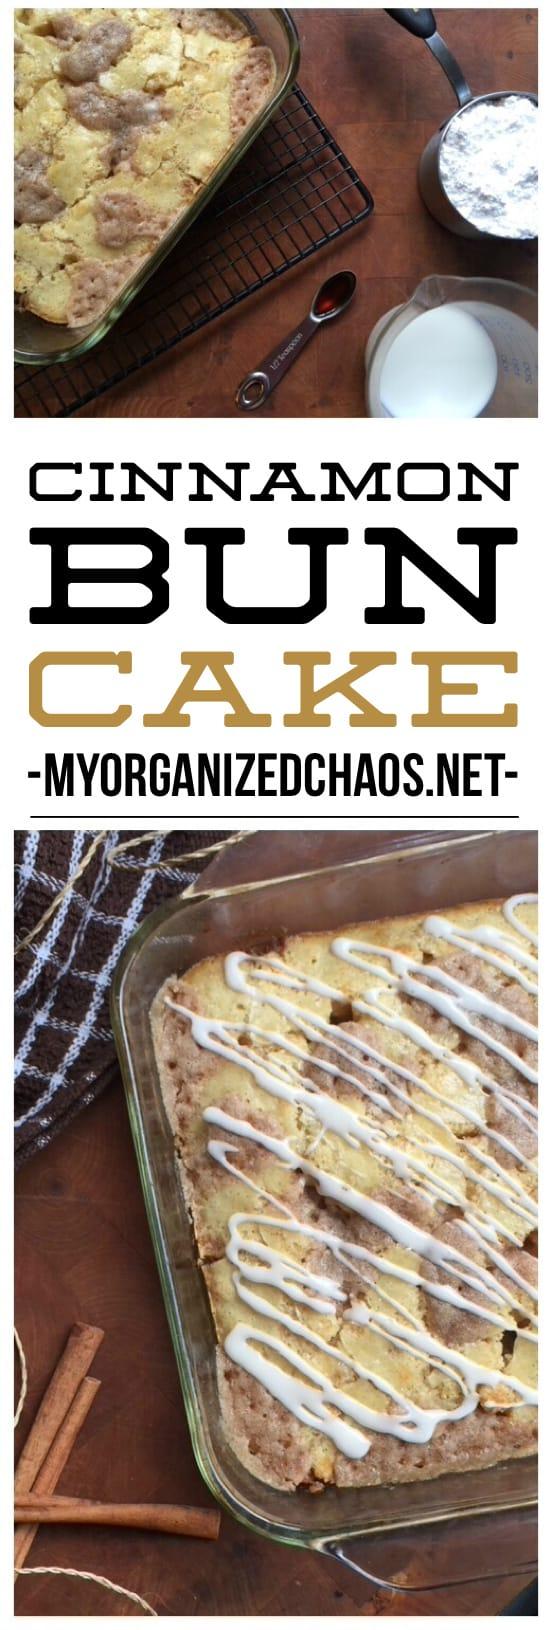 Cinnamon Bun Cake easy Recipe